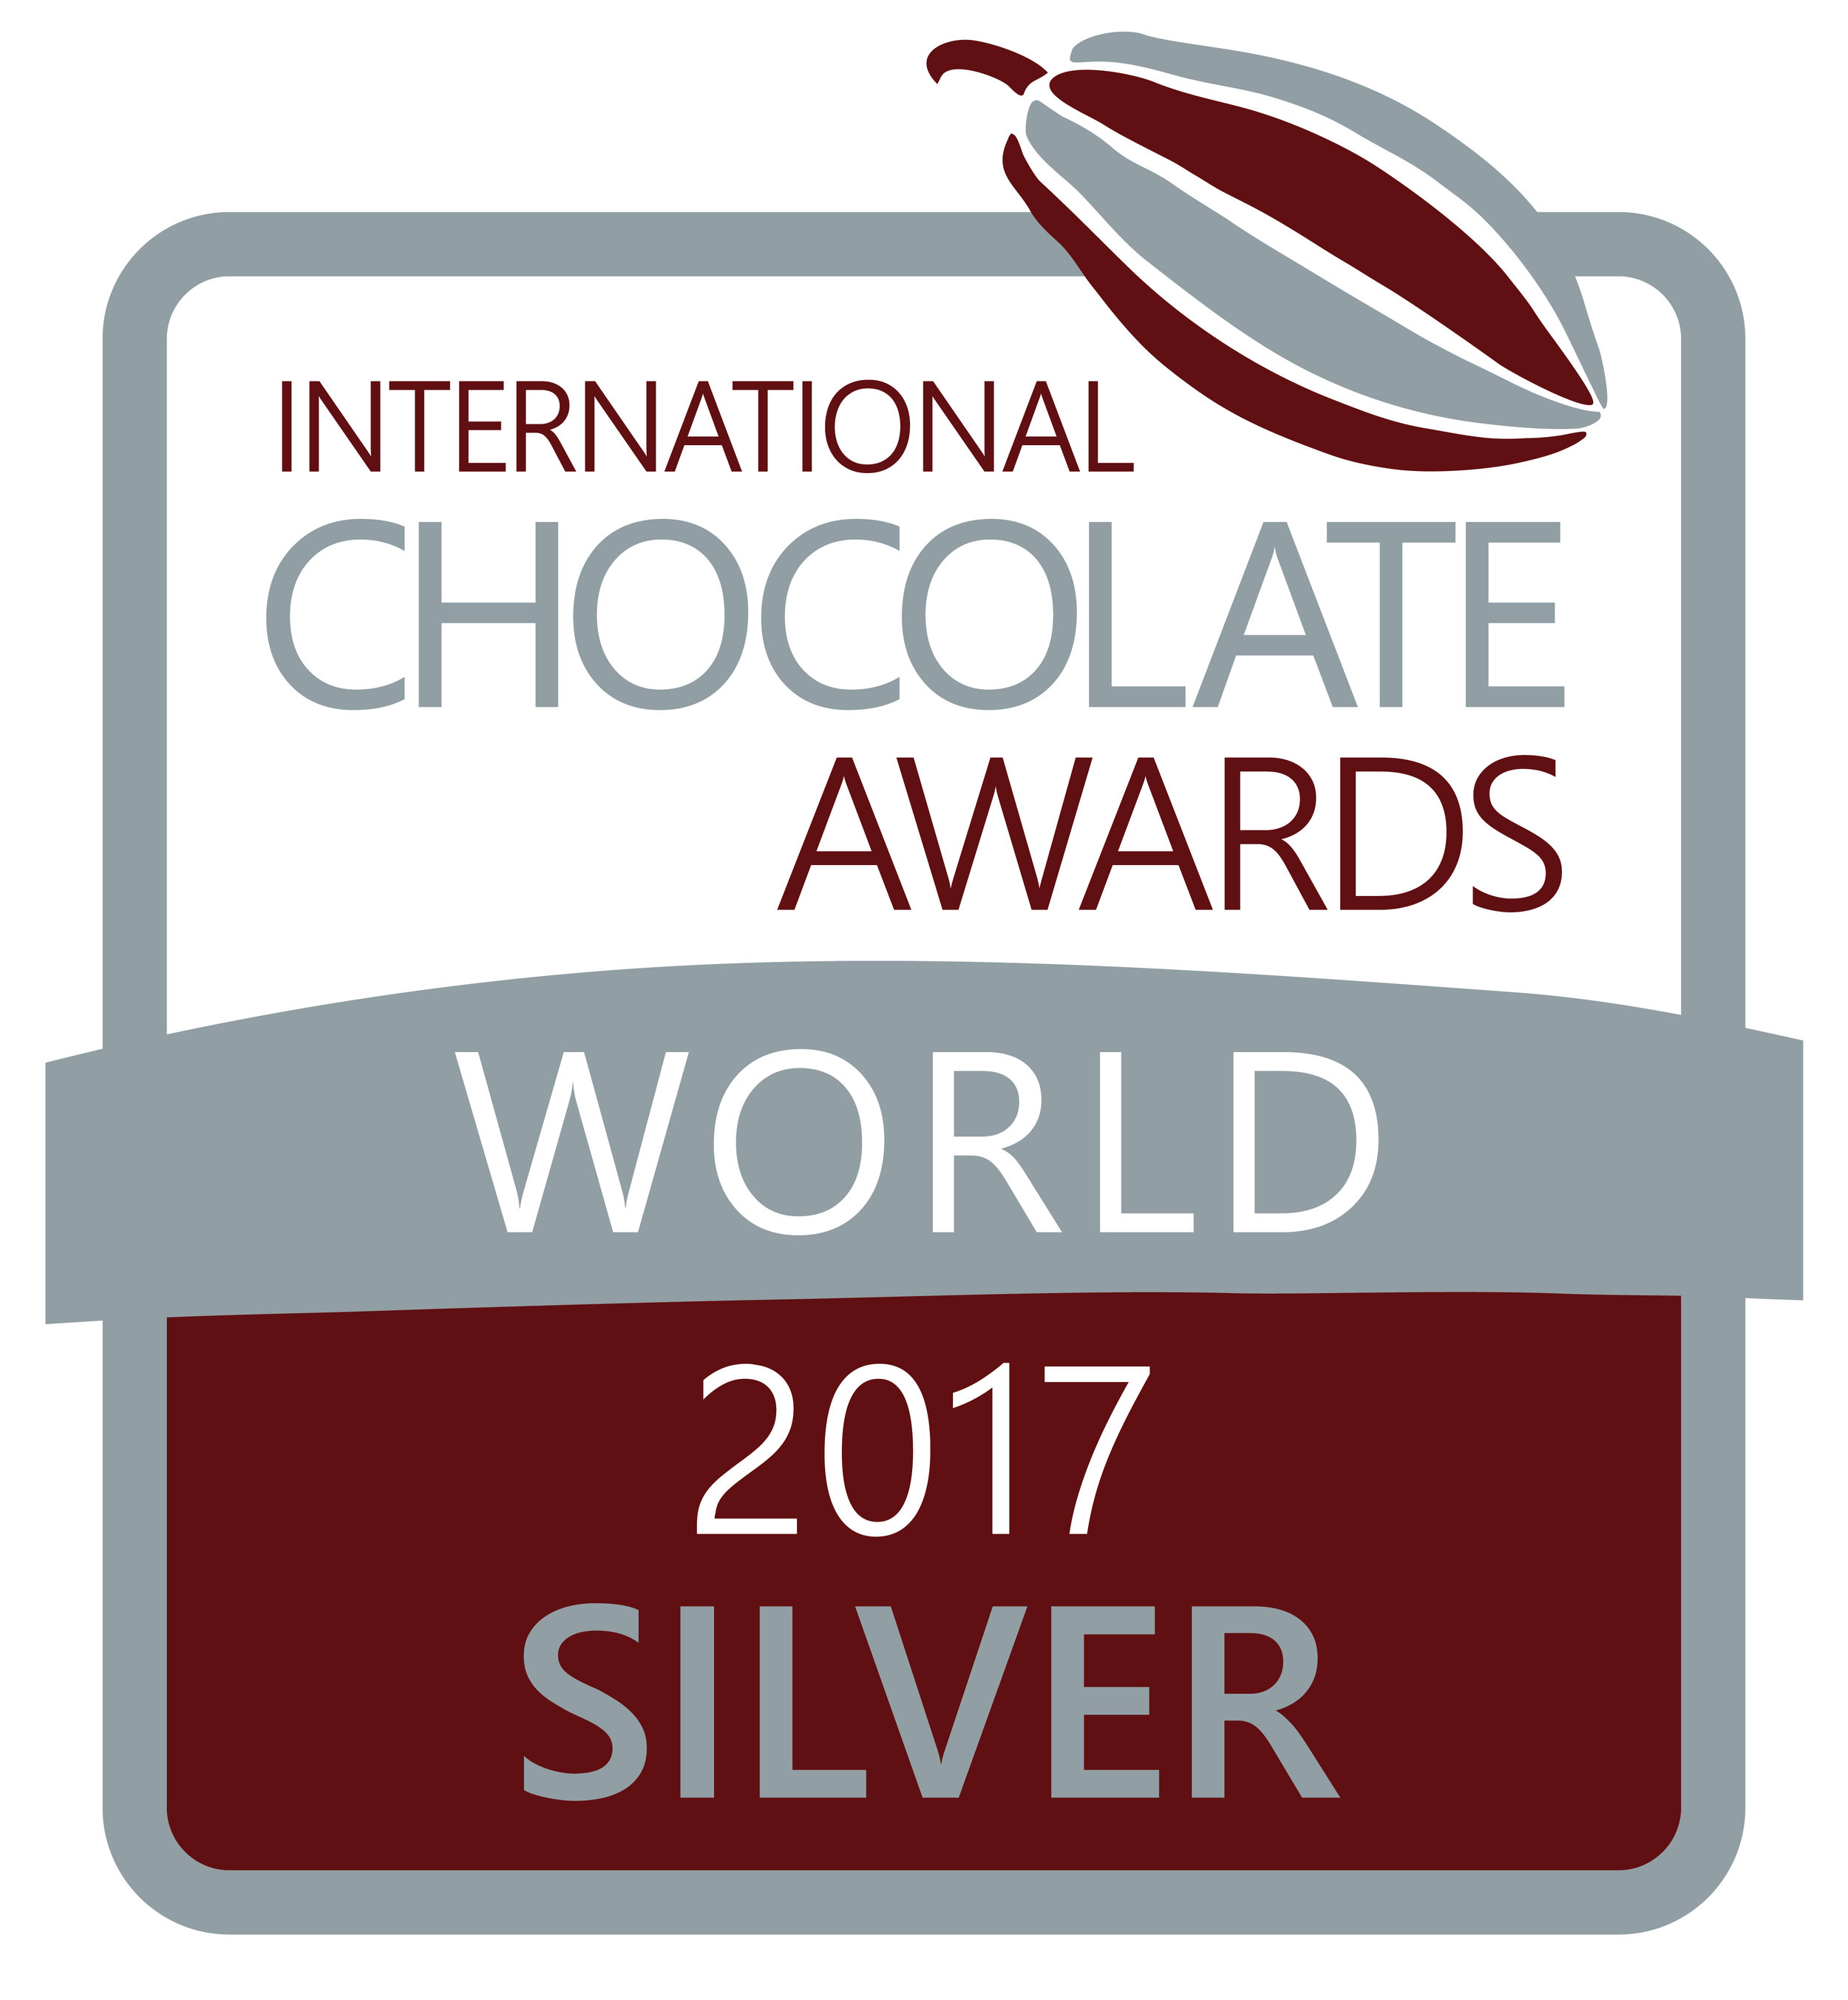 ica-prize-logo-2017-silver-world-rgb.jpg